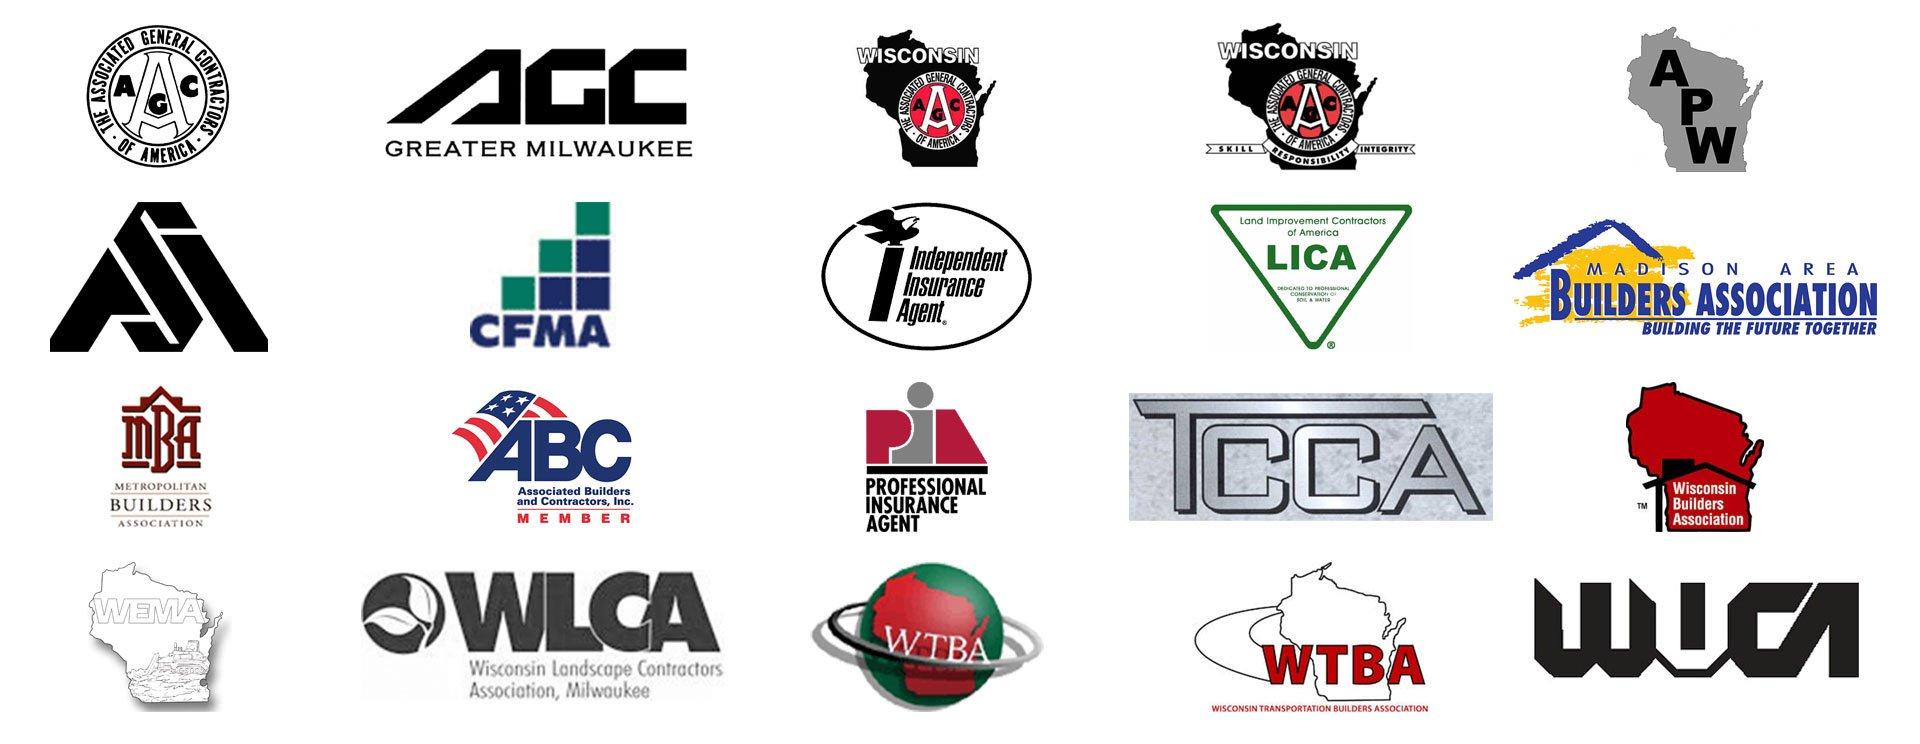 Construction-Association-Logos